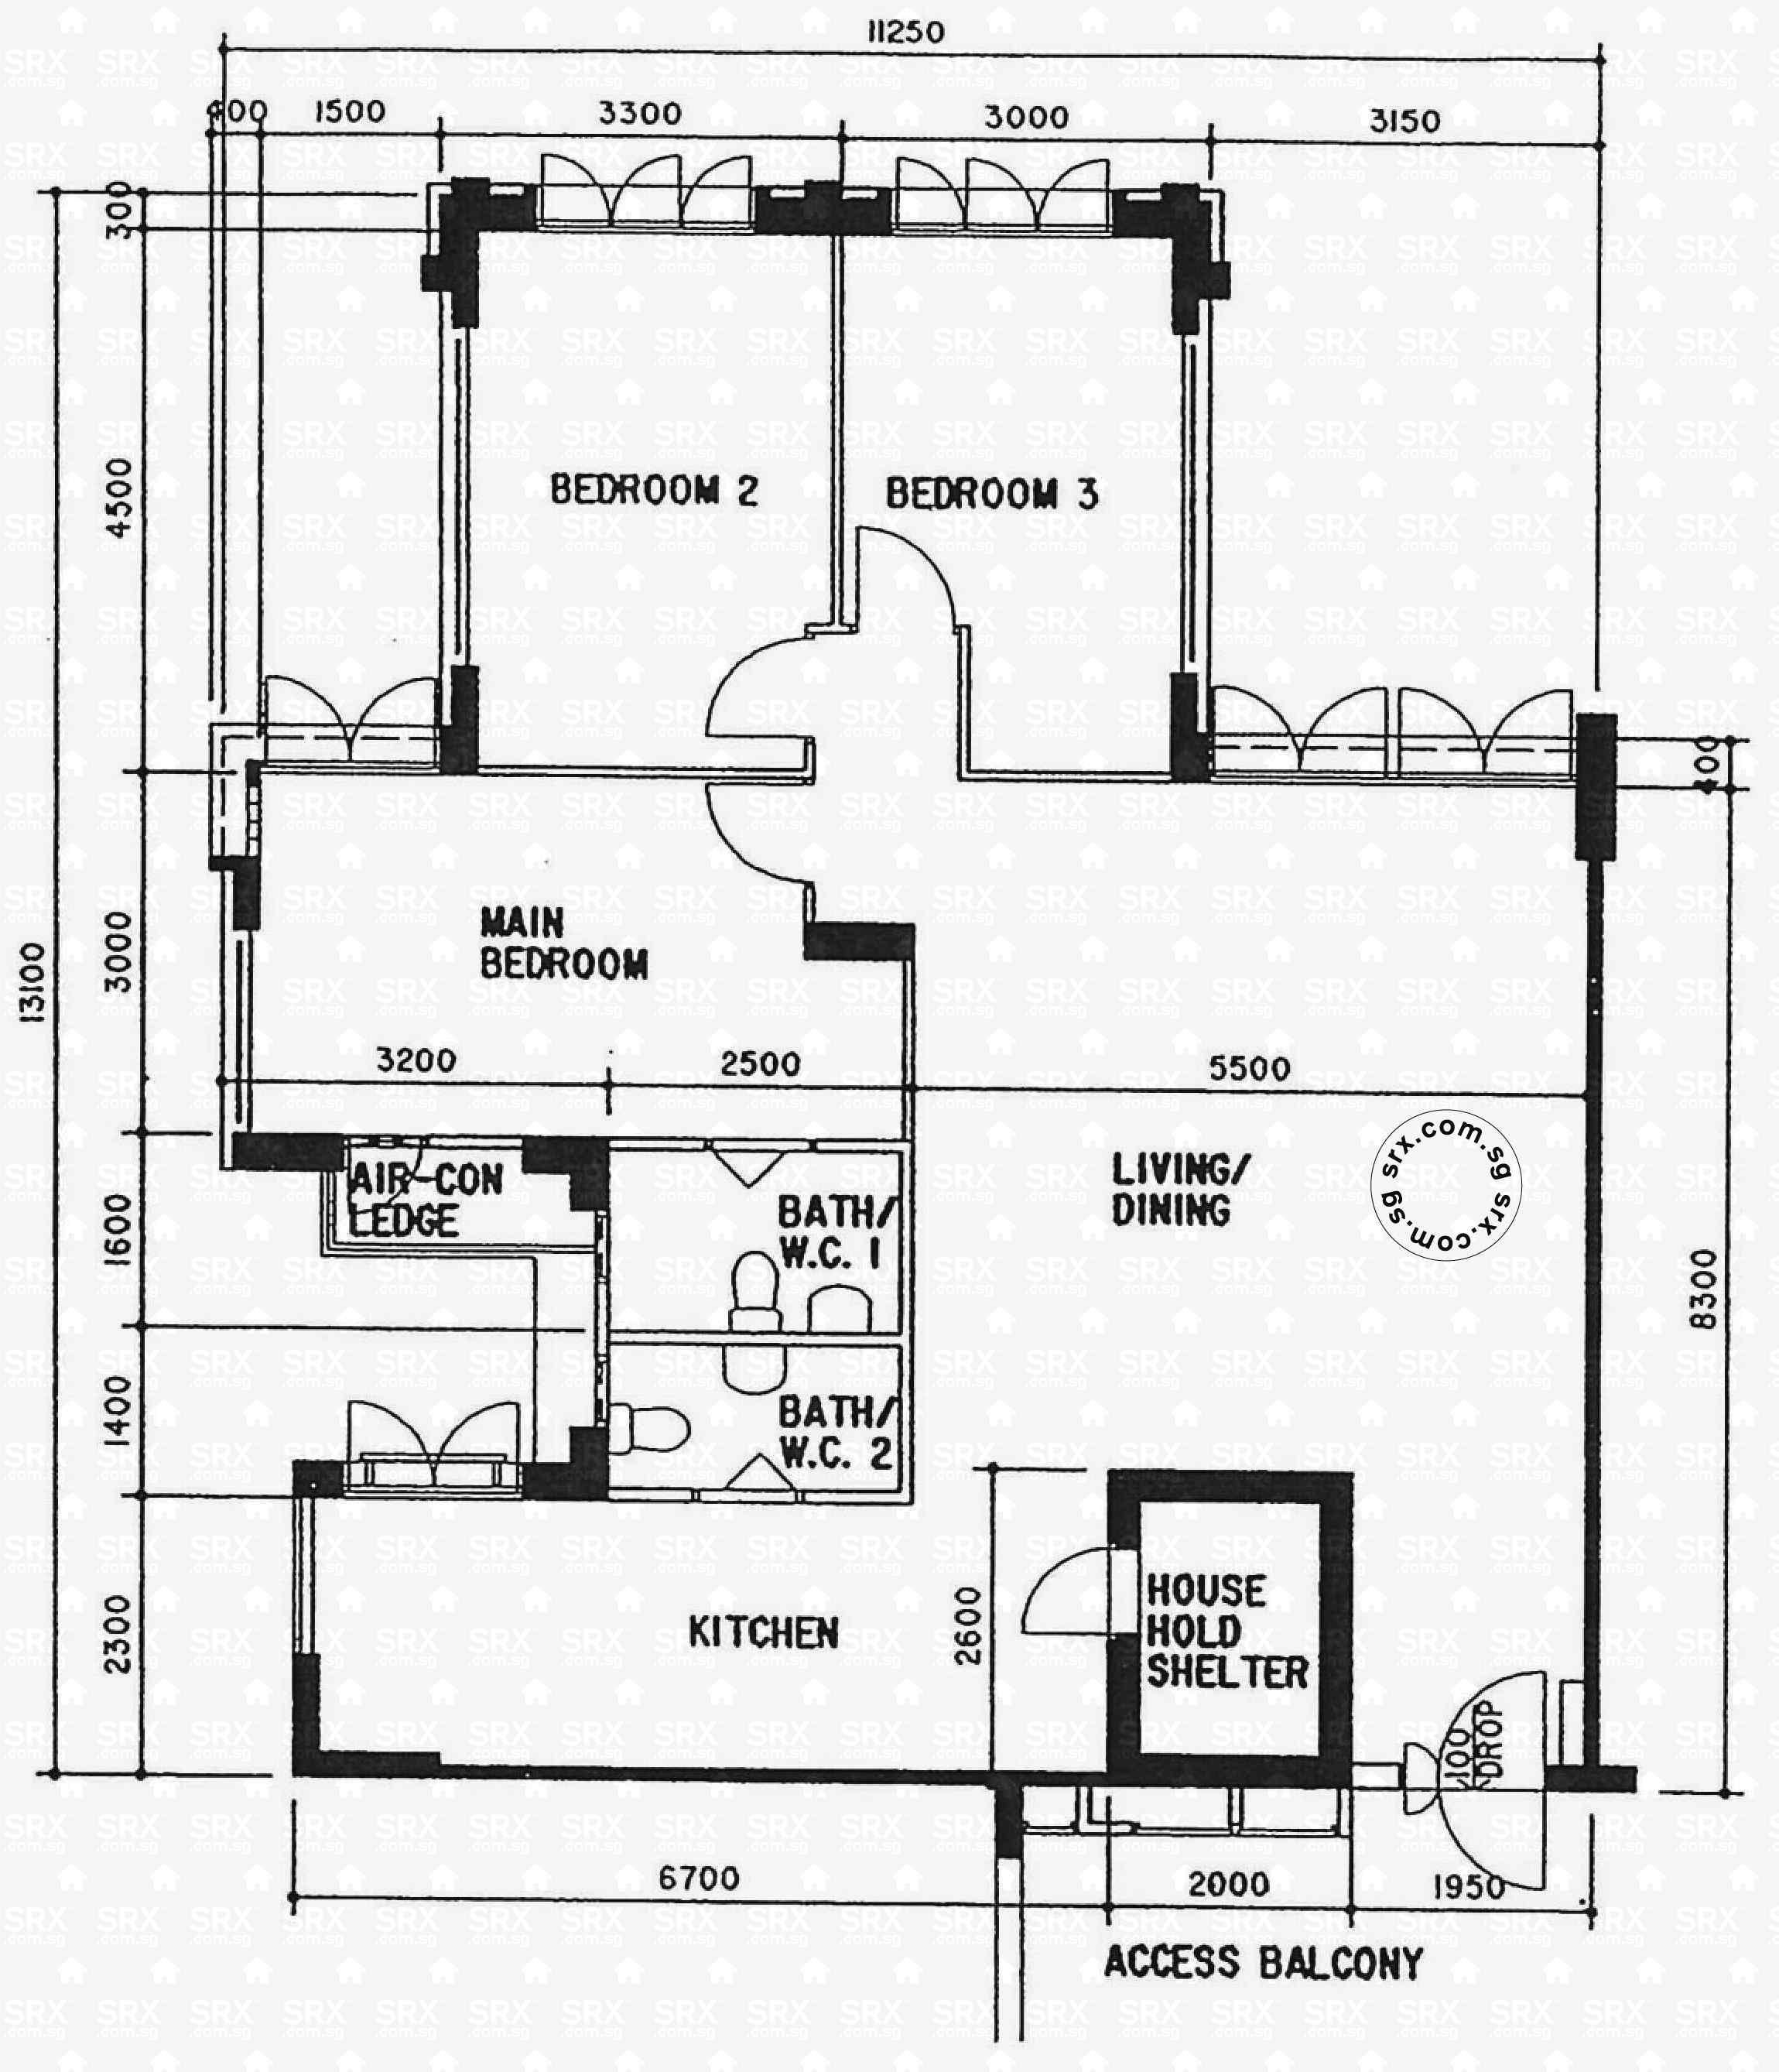 Floor plans for choa chu kang crescent hdb details srx for 1077 marinaside crescent floor plan